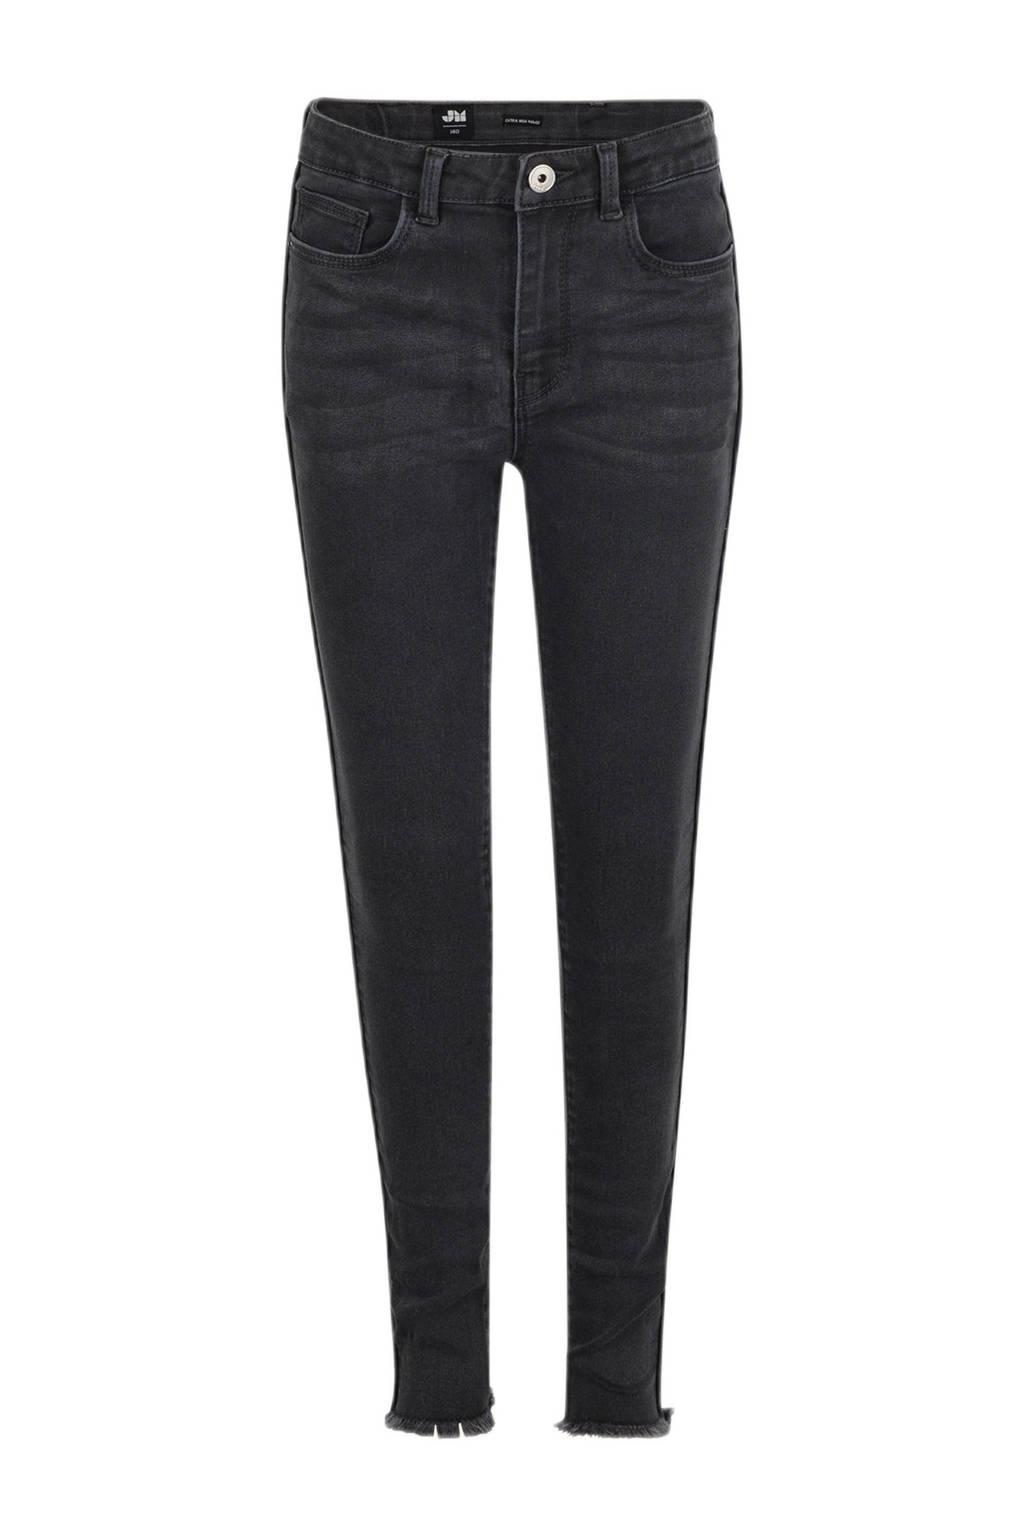 Shoeby Jill & Mitch skinny jeans Chrissy grijs stonewashed, Grijs stonewashed